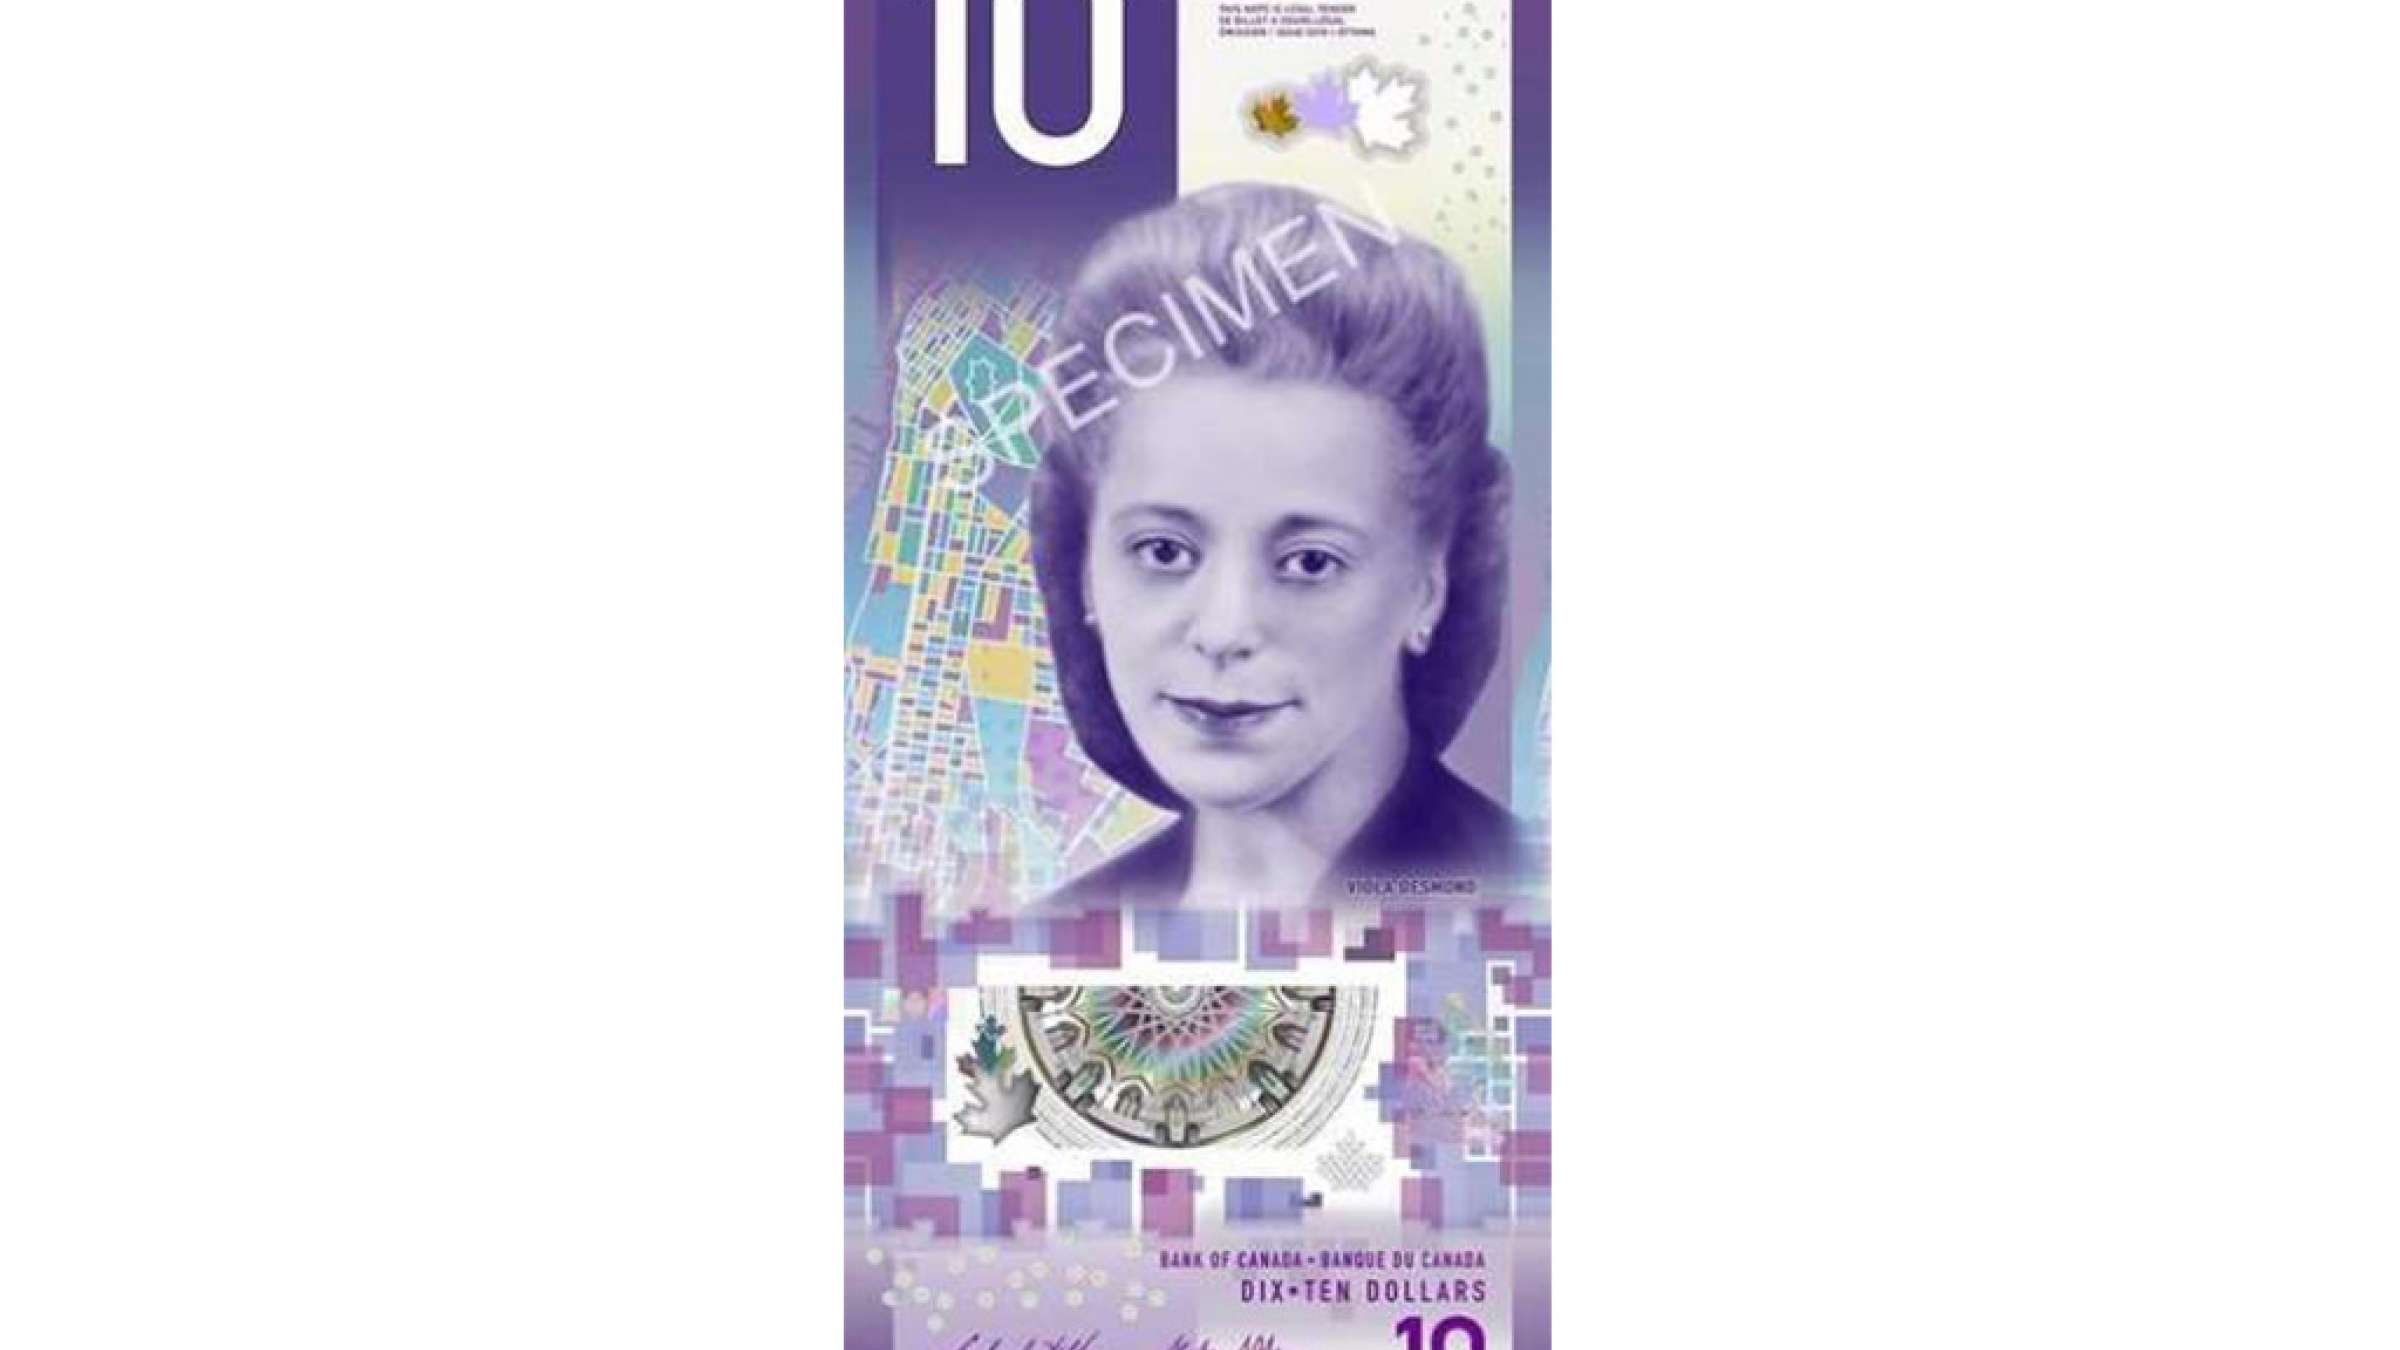 news-eskenas-10-dollari-gir-mikonad